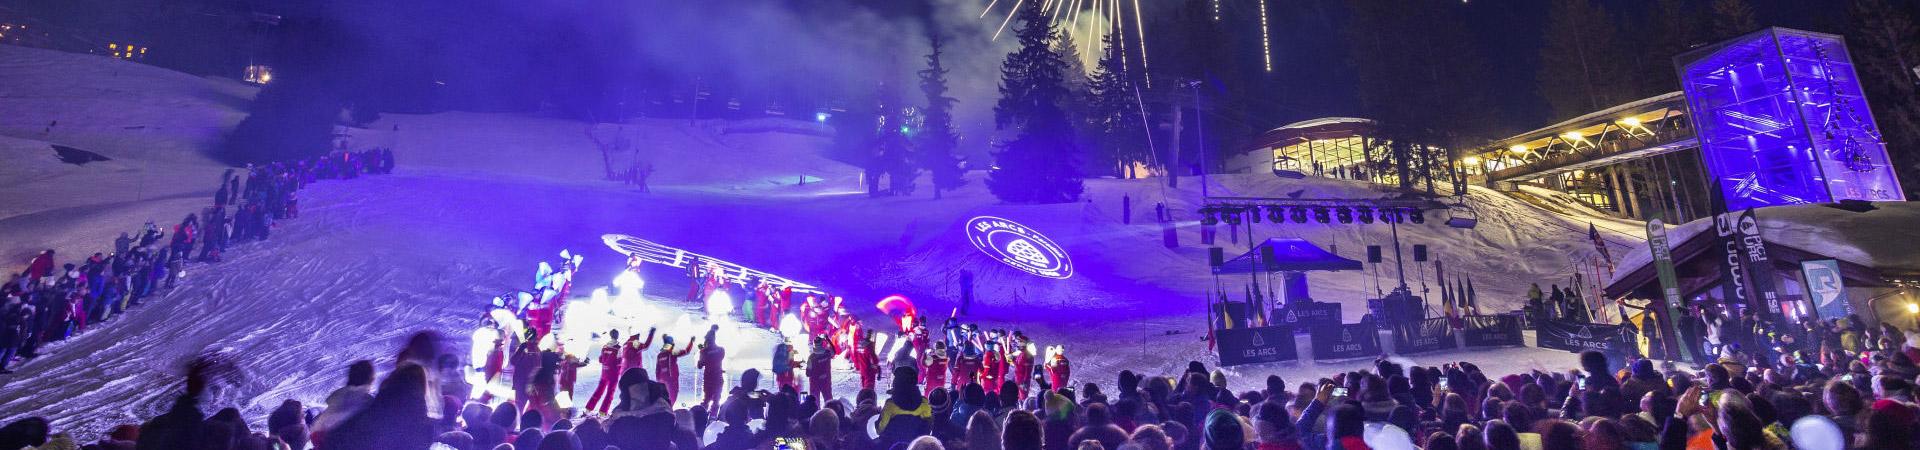 SkiShow-lesArcs50ans-ManuReyboz__42_.jpg